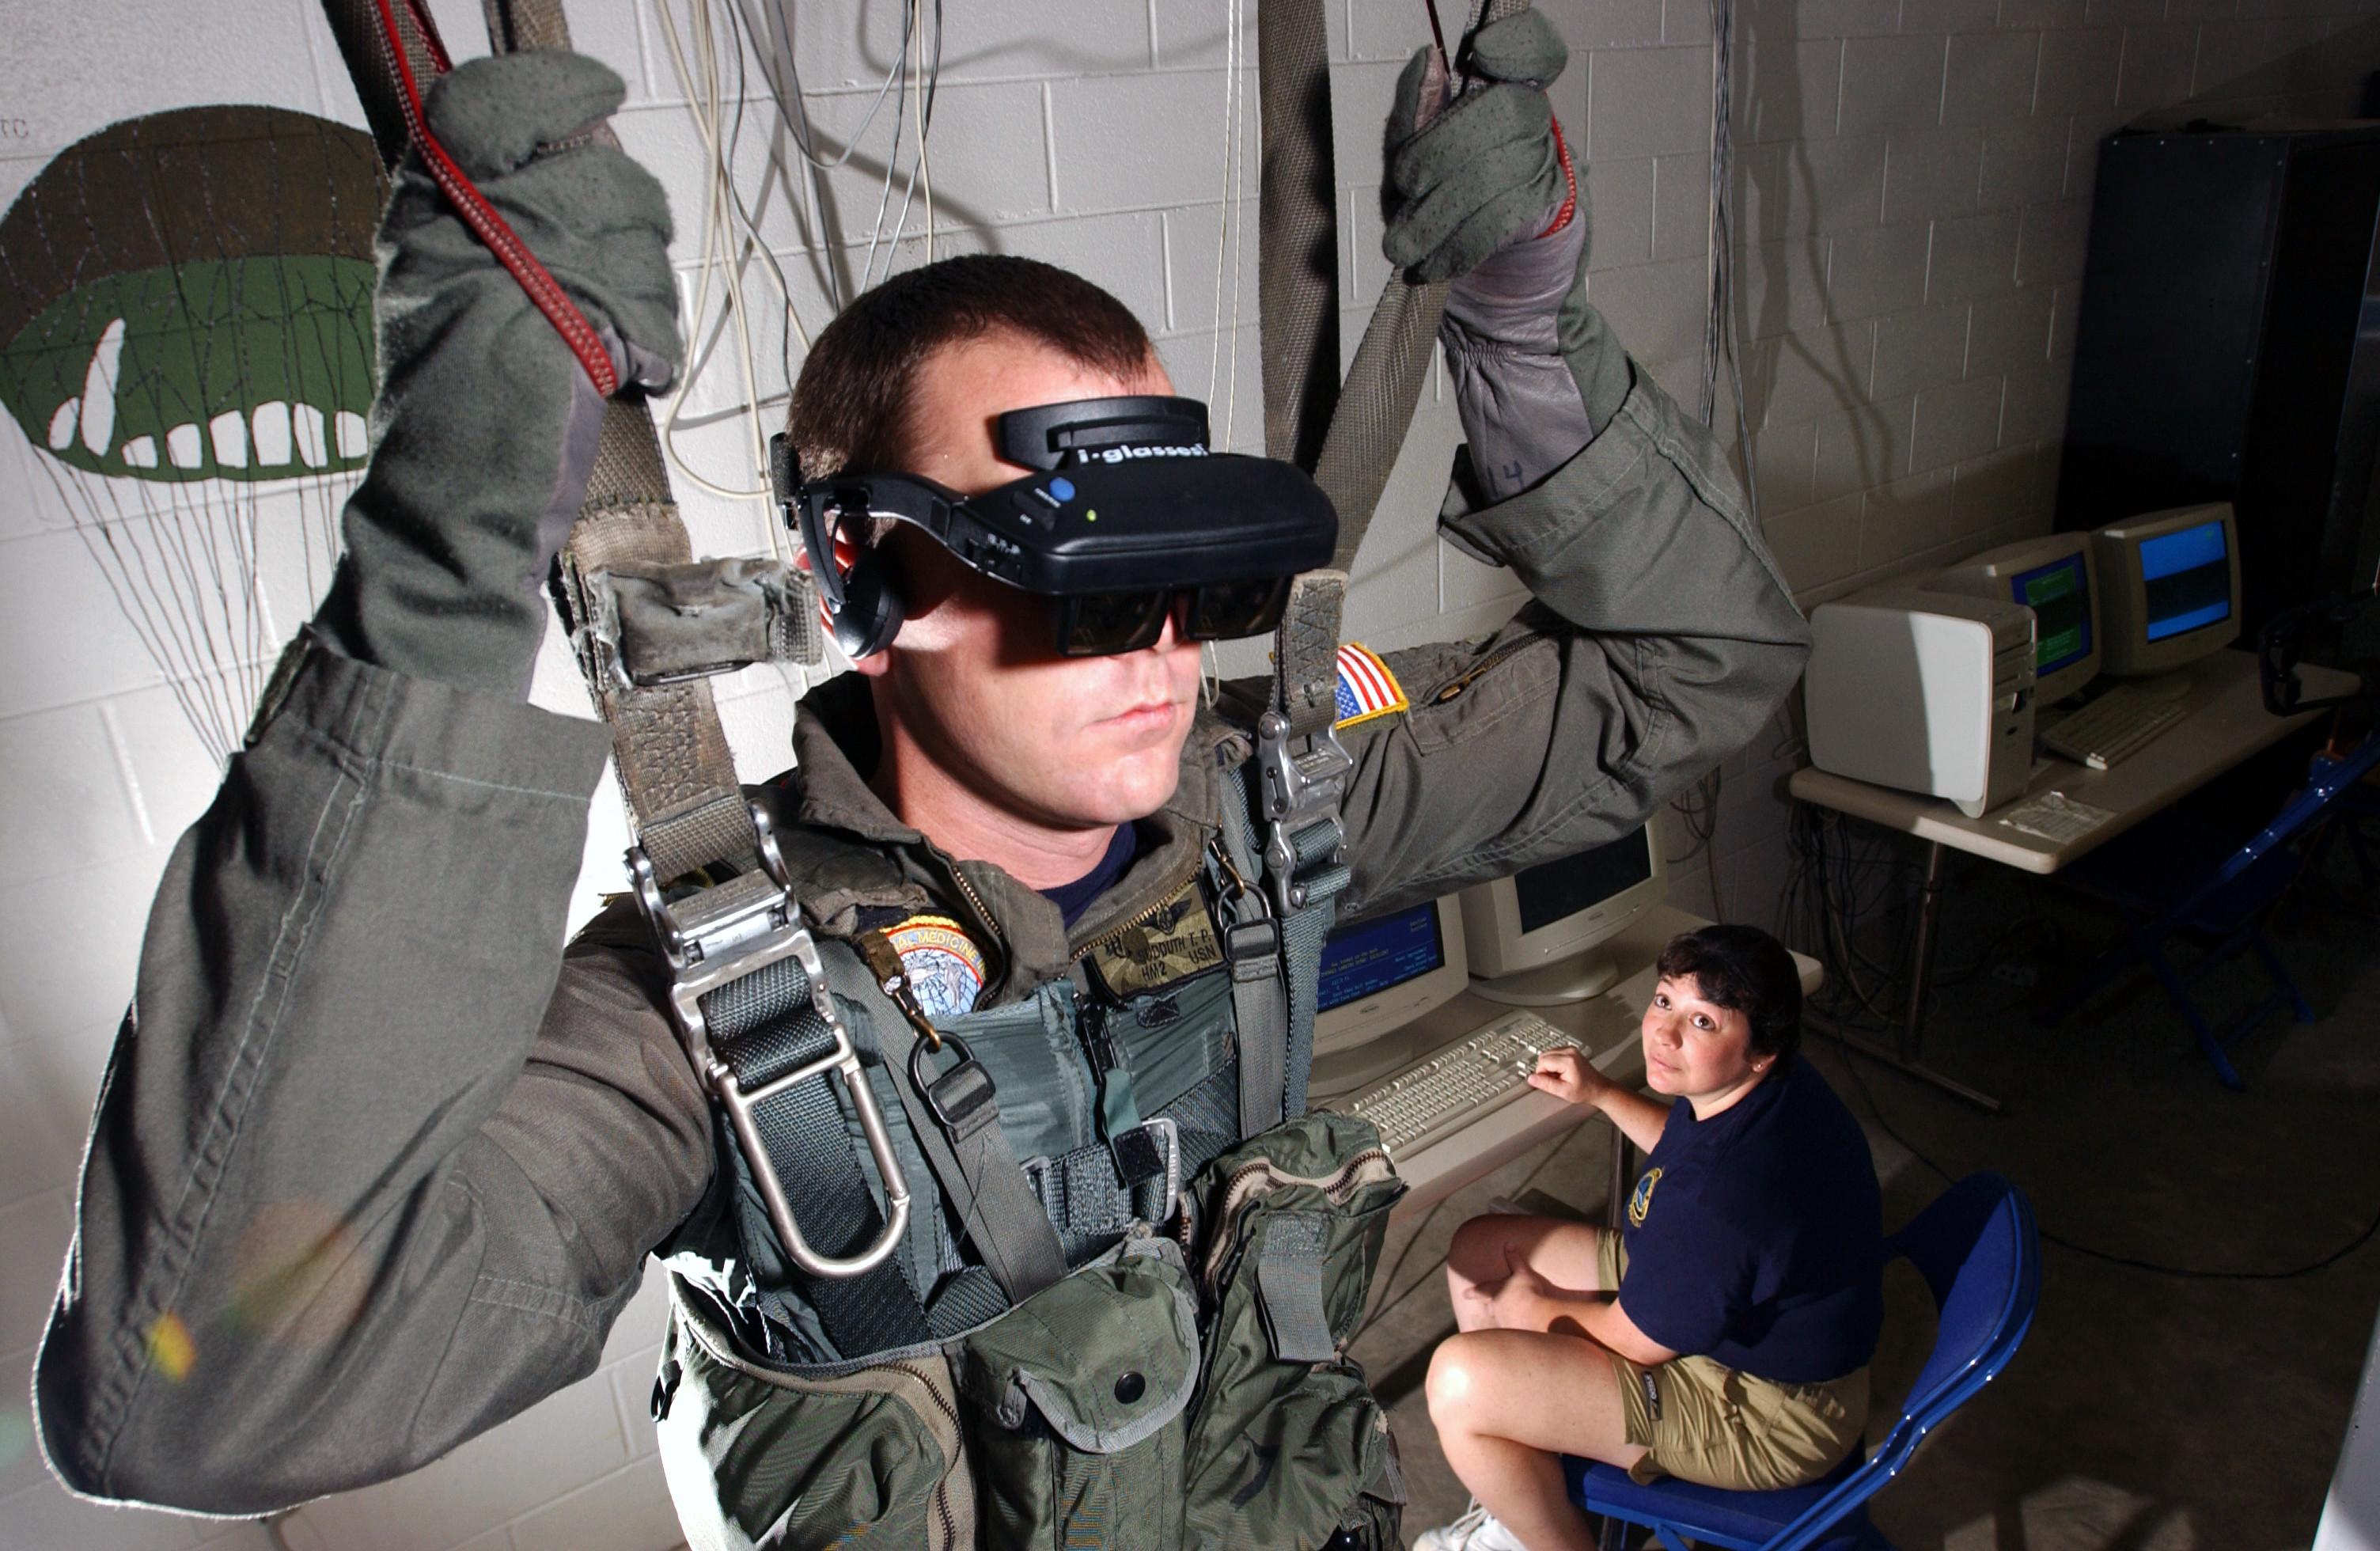 Virtuele Werkelijkheid Betekenis